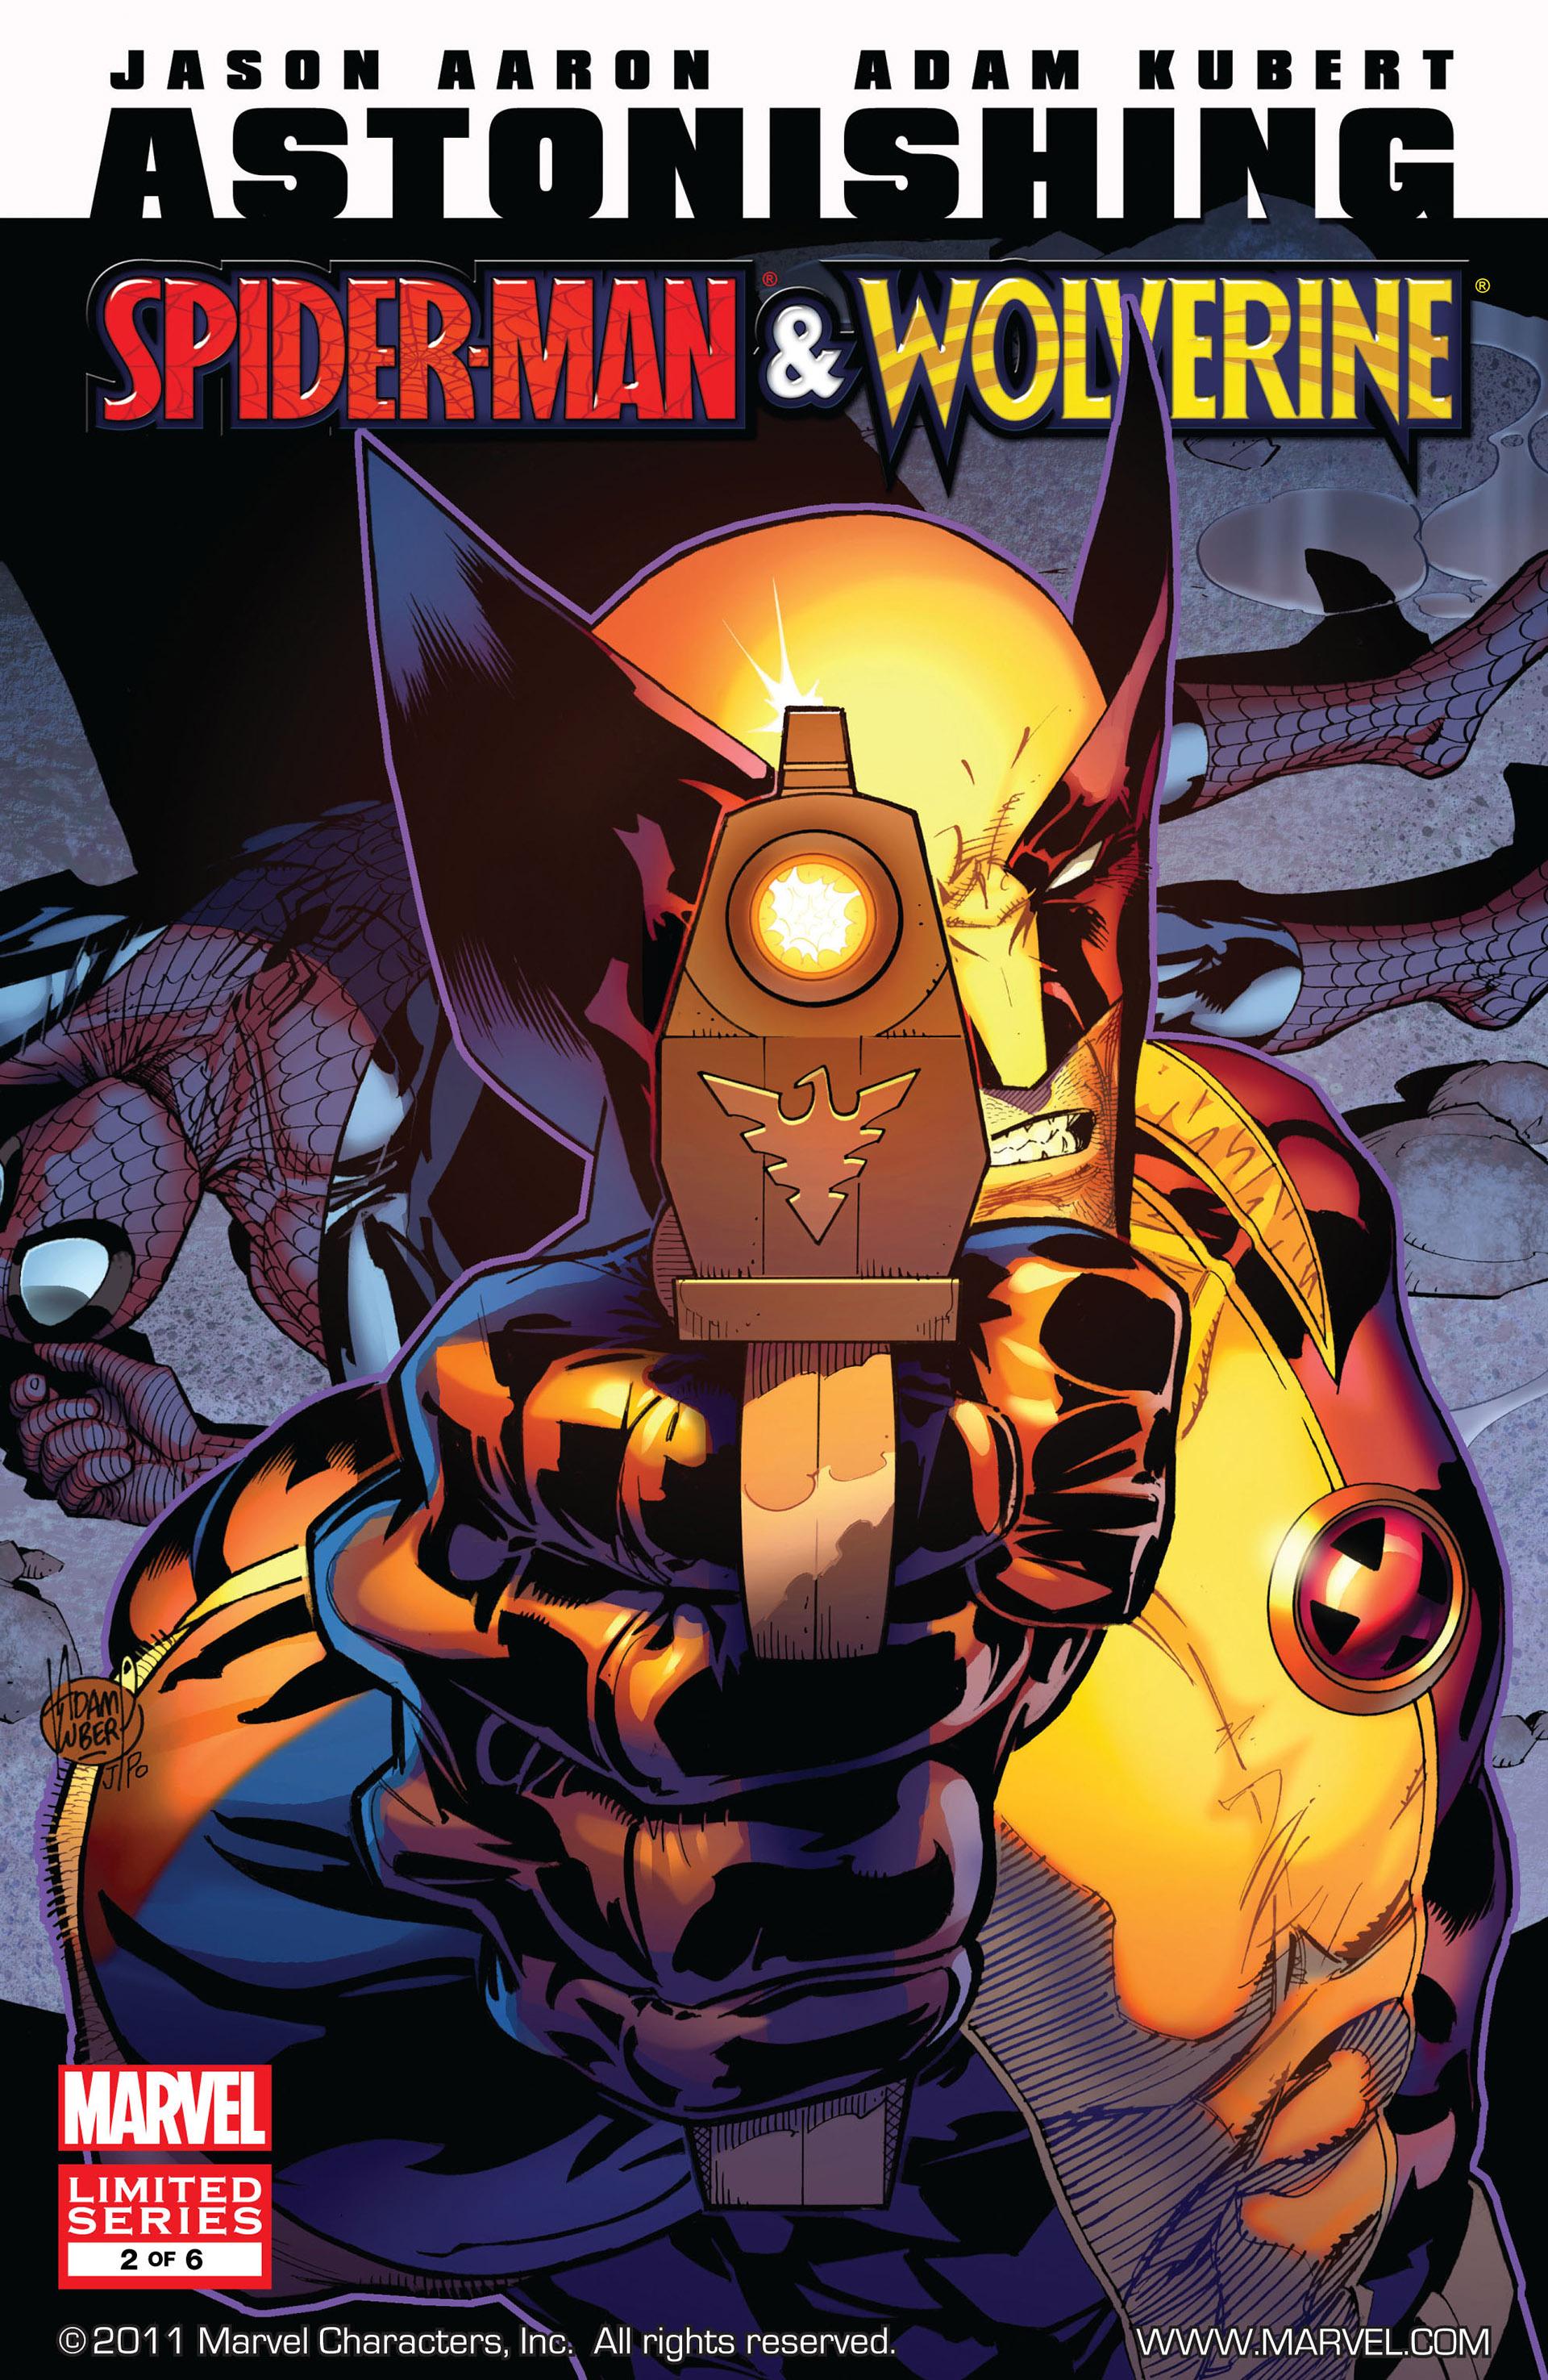 Read online Astonishing Spider-Man & Wolverine comic -  Issue #2 - 1